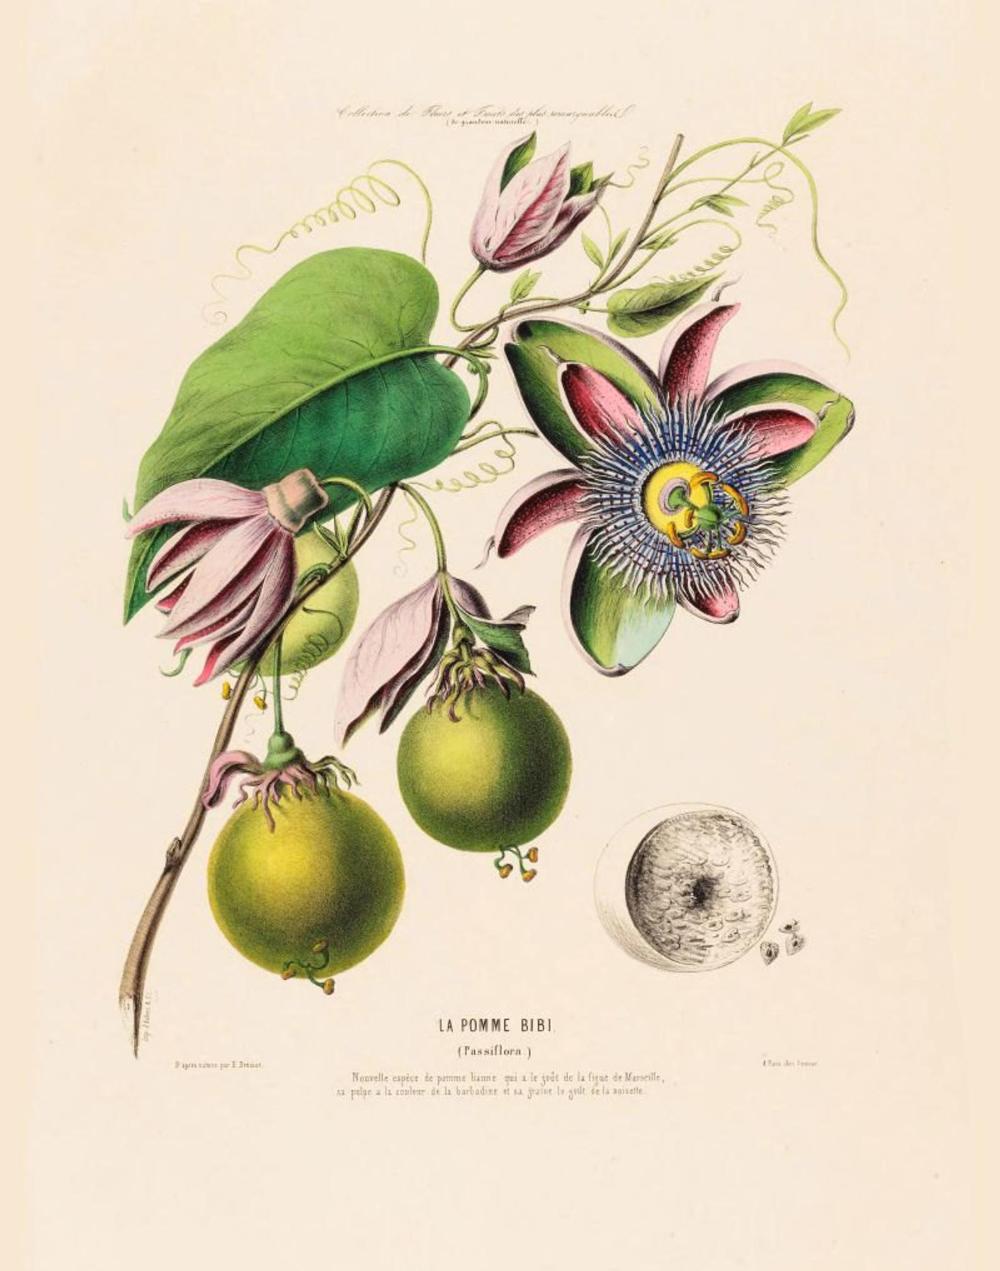 Antique French Botanical Print Pomme Bibi Passiflora Passion Etsy In 2020 Botanical Prints French Illustration Flower Illustration